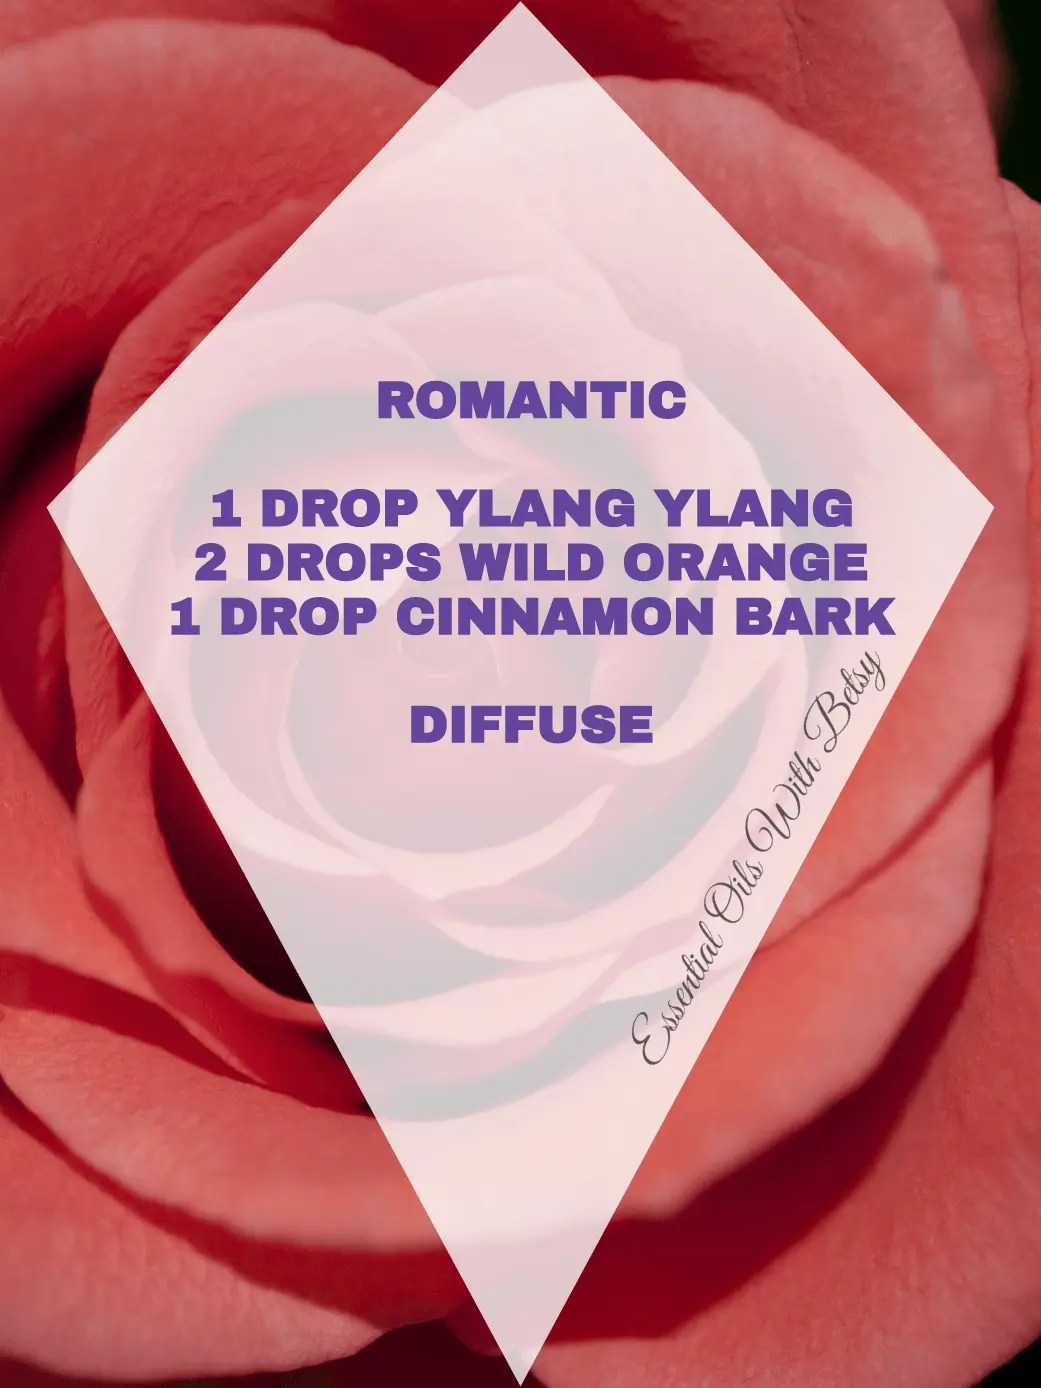 15 BRAND NEW DIFFUSER BLENDS ROMANTIC: 2 DROP YLANG YLANG 2 DROPS WILD ORANGE 1 DROP CINNAMON BARK